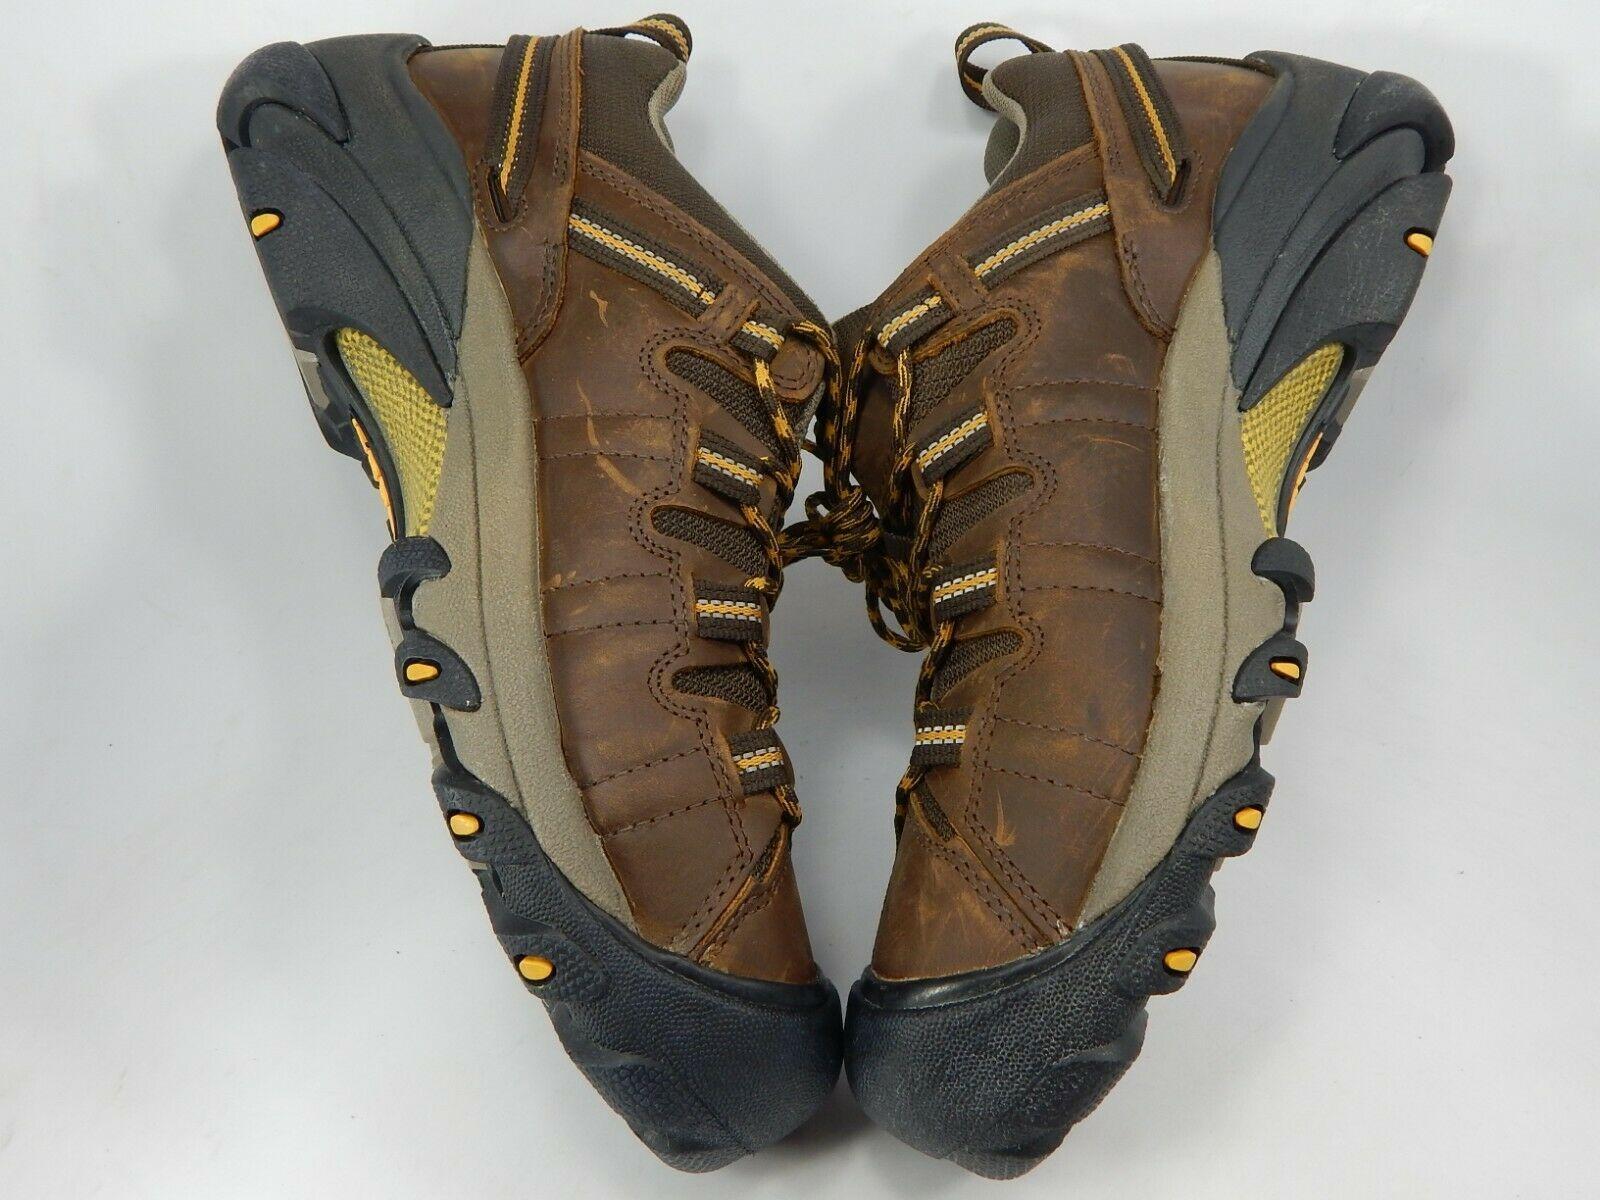 Keen Targhee II Niedrig Größe Us 10 M (D) Eu 43 Herren Wp Trail Wanderschuhe